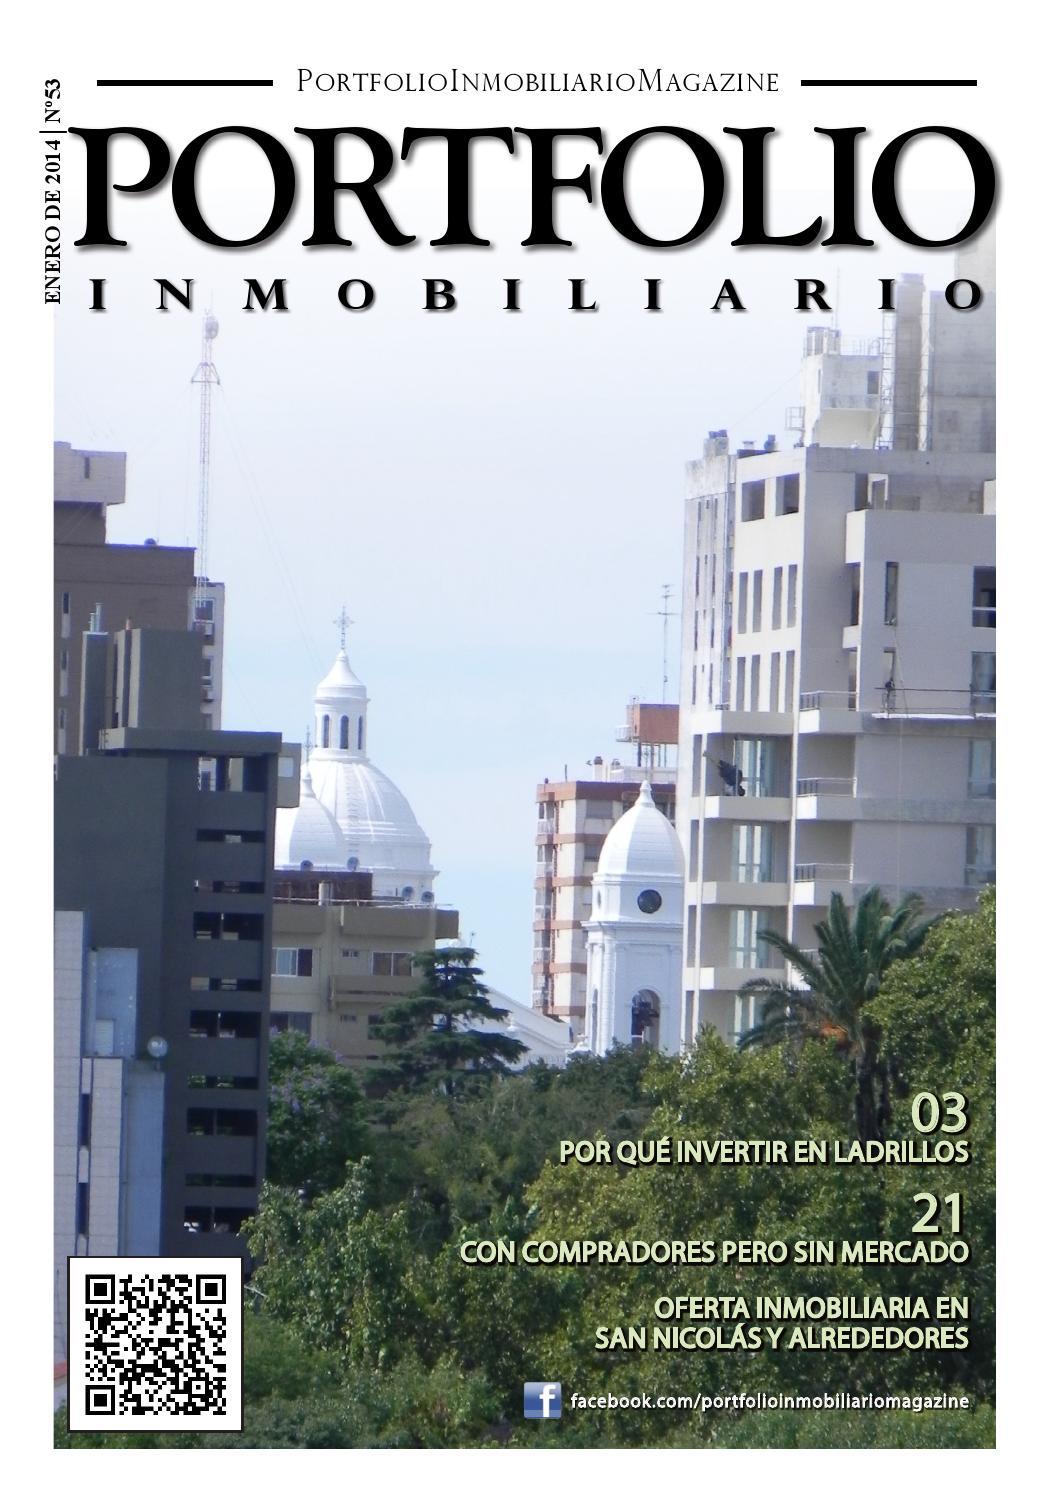 Famosos Portfolio inmobiliario enero 14 by PORTFOLIO INMOBILIARIO - issuu EO89